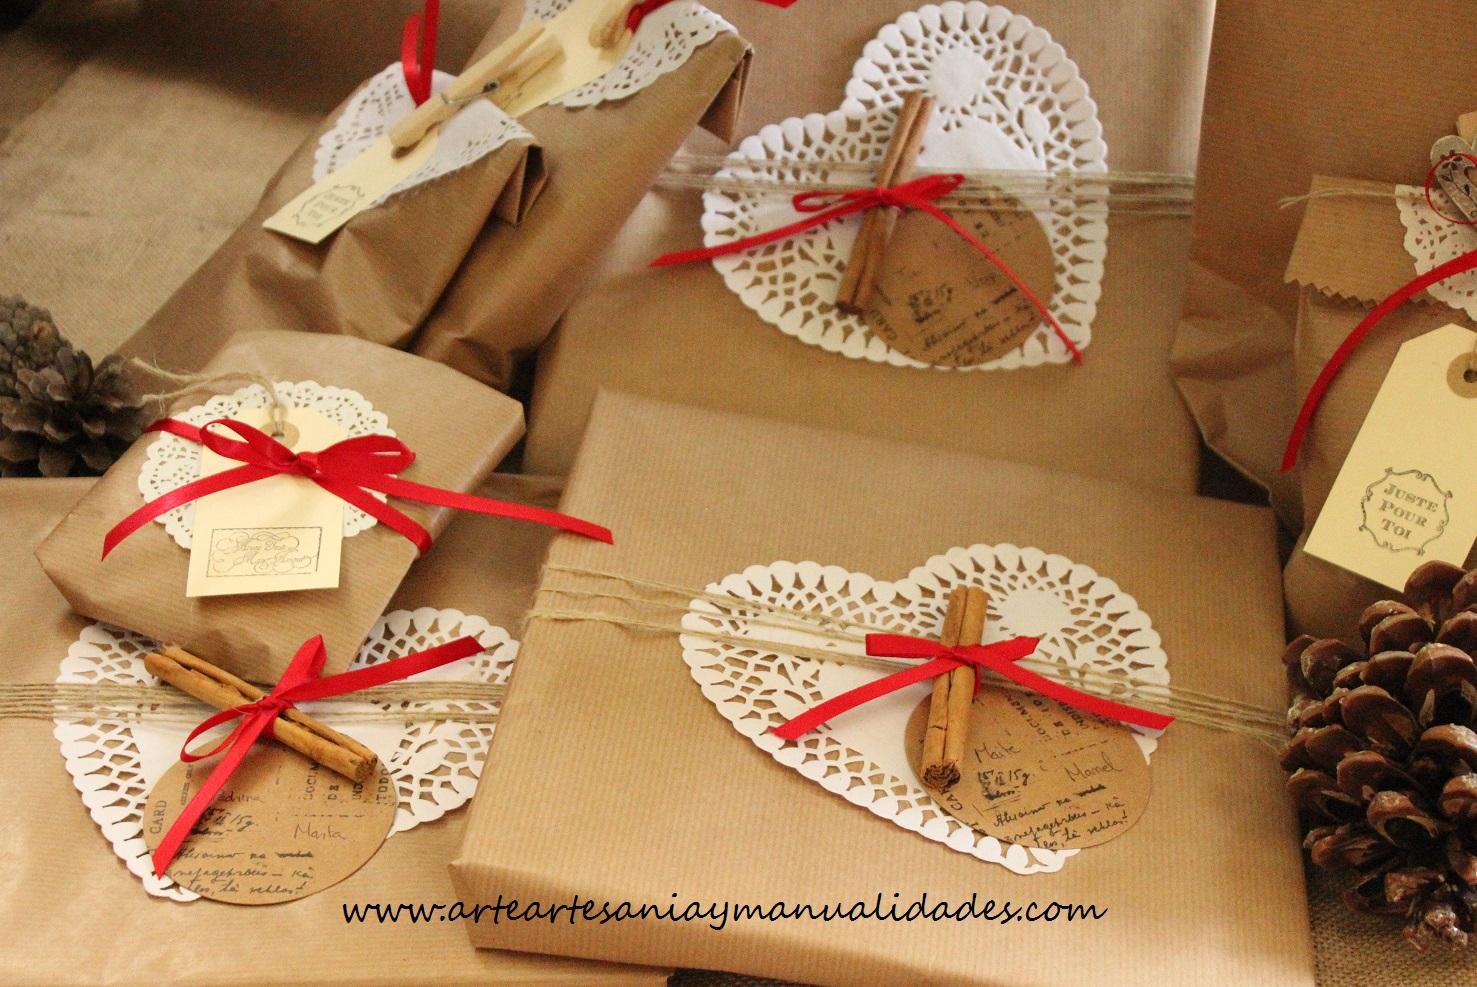 Arte artesania y manualidades packaging creativo de navidad for Manualidades de navidad 2016